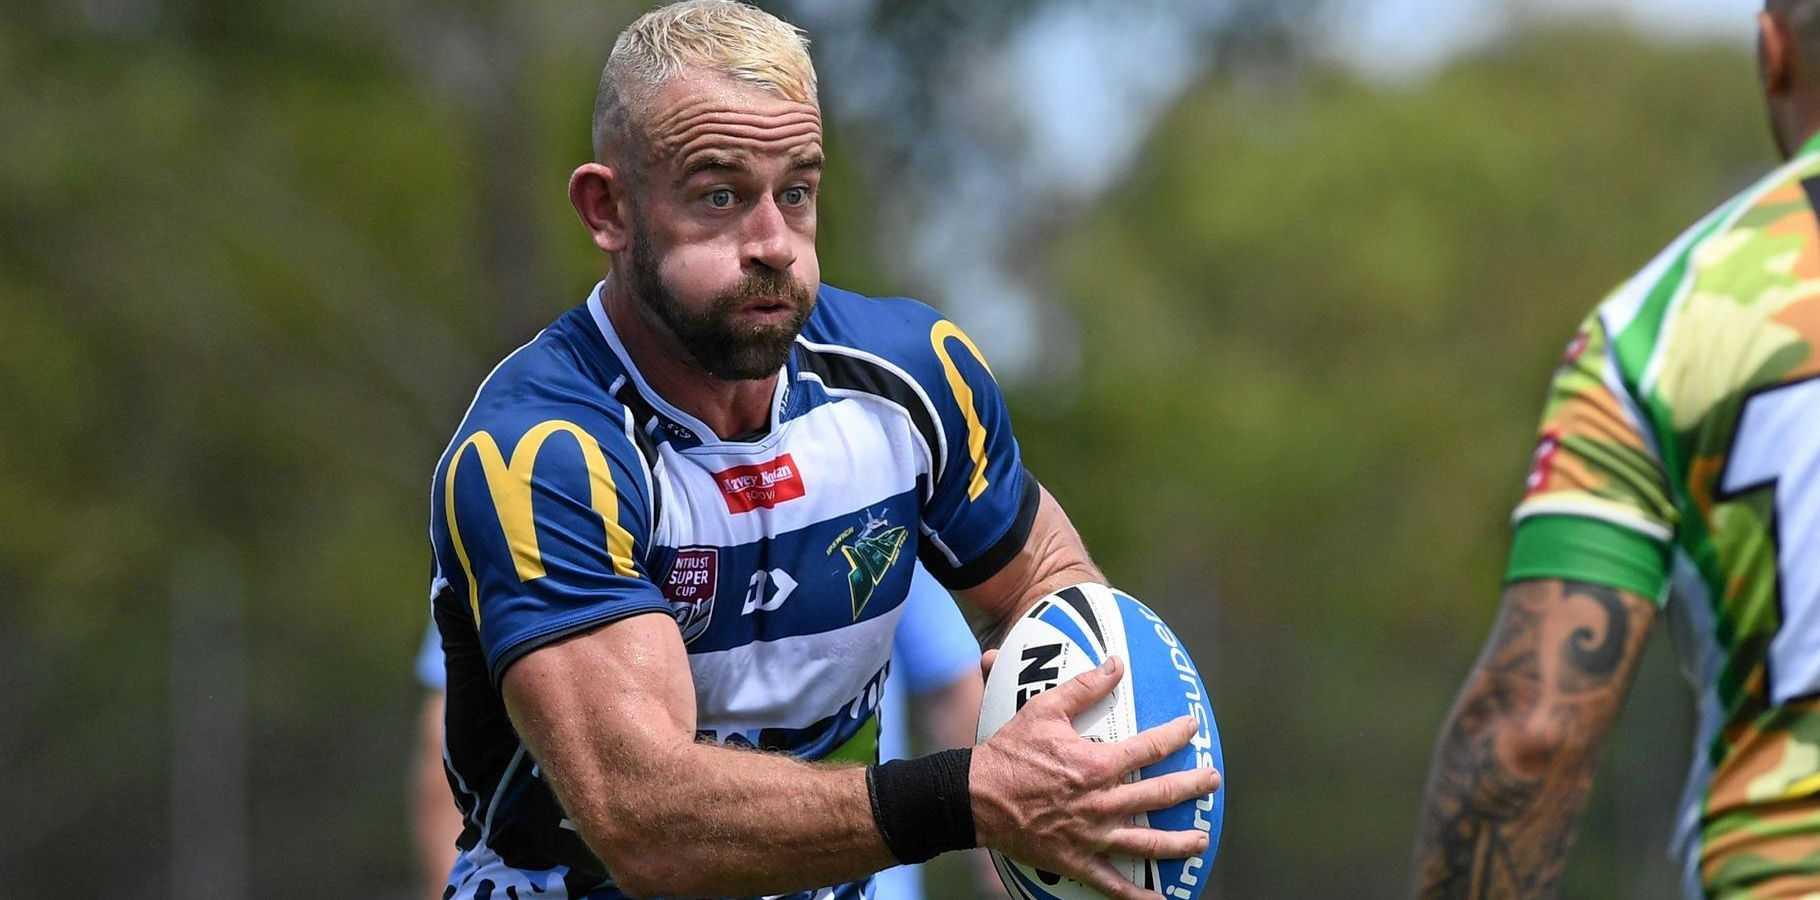 Ben Shea rocks the platinum blonde against Townsville last weekend.